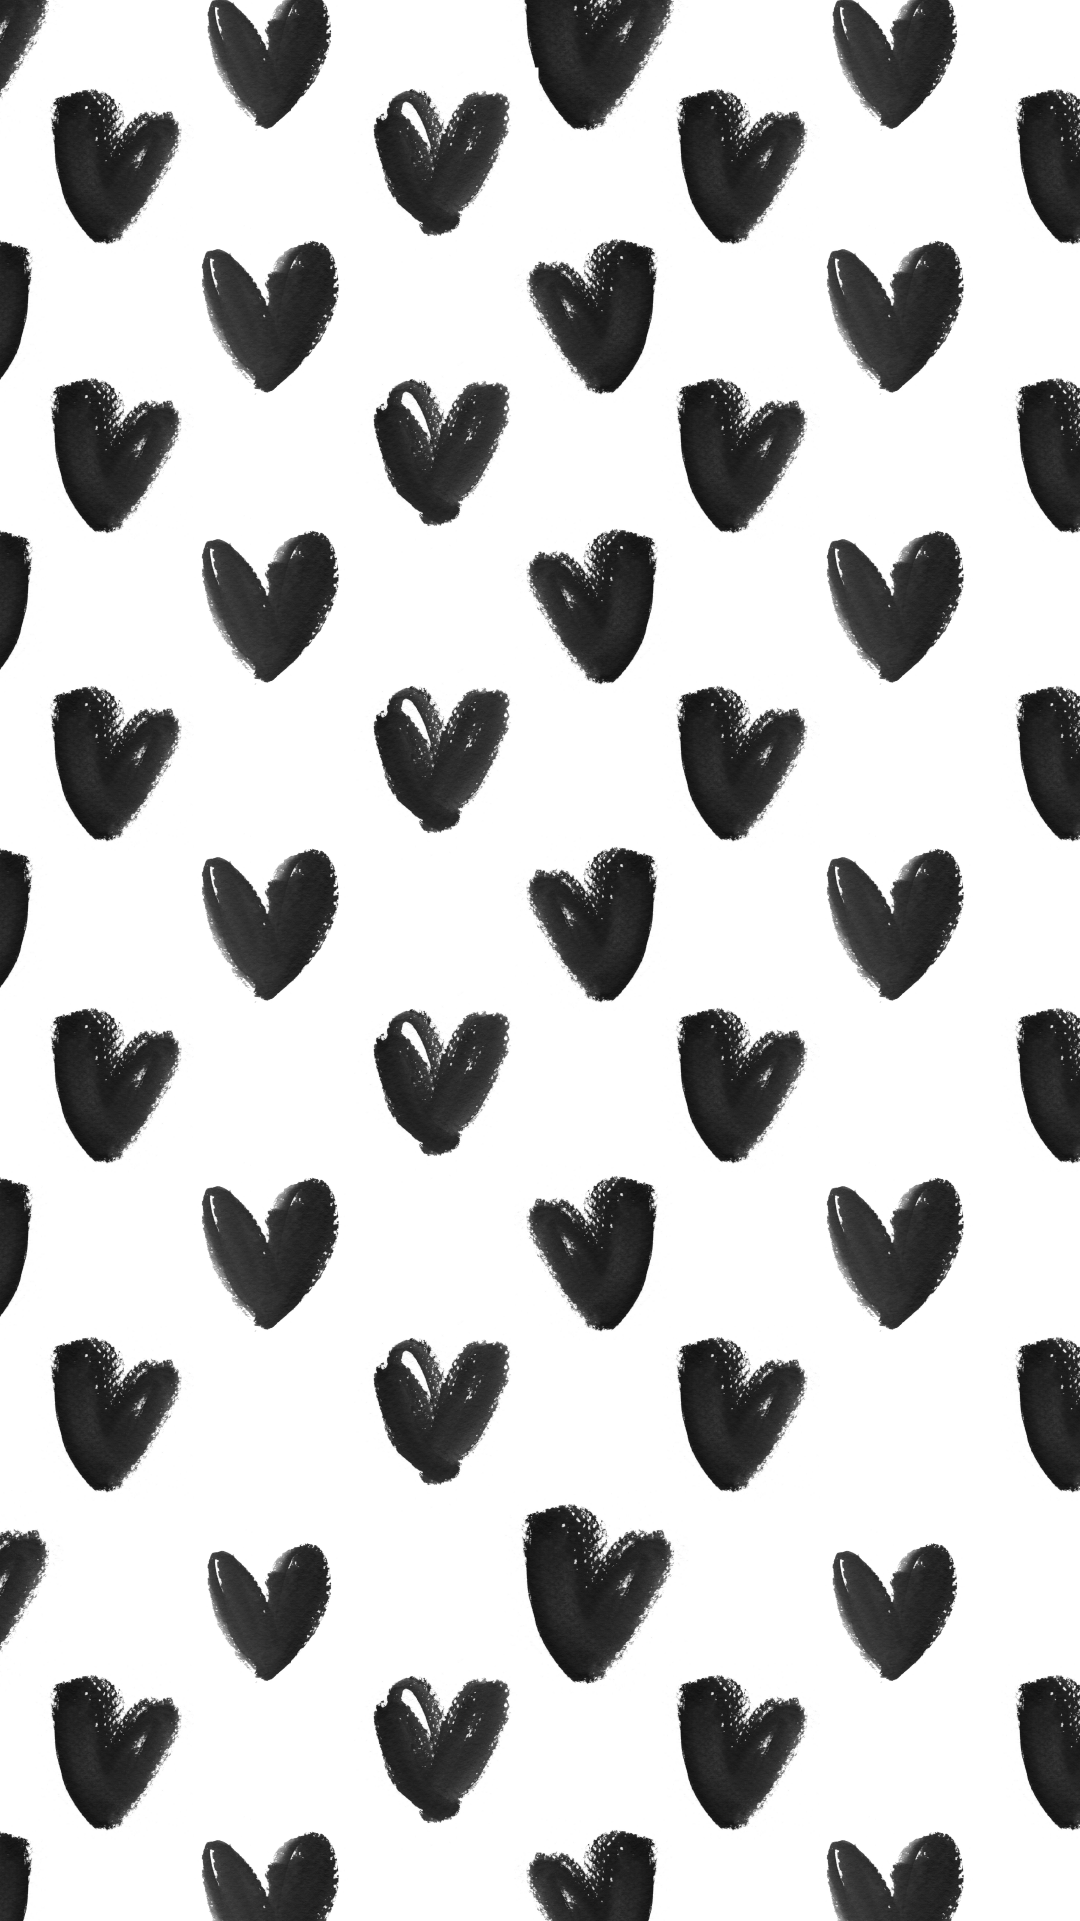 Black White watercolour hearts iphone background wallpaper phone lock screen                                                                                                                                                      More